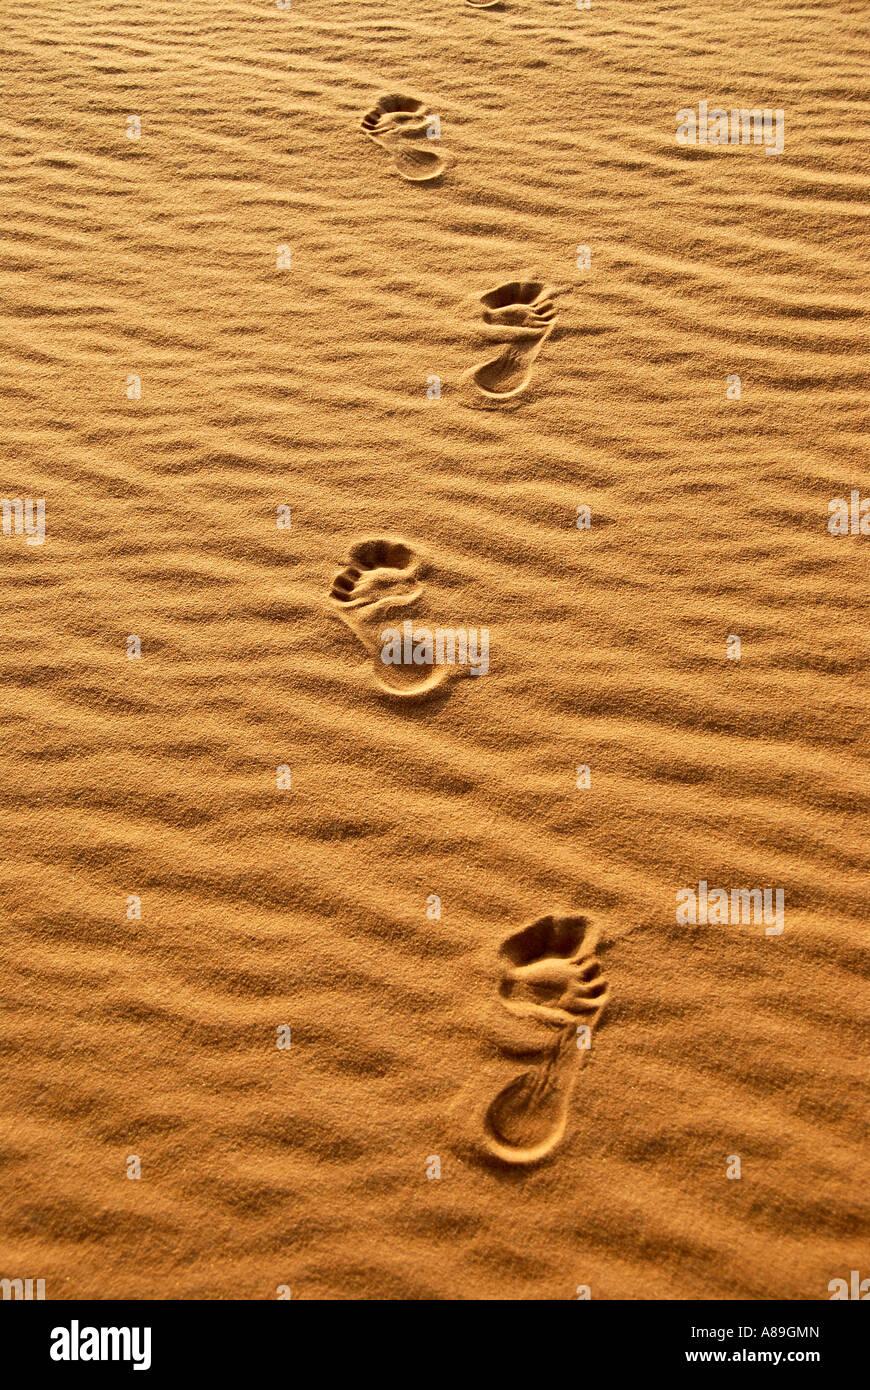 Human track Homo sapiens sapiens with in the sand Mandara Libya Stock Photo